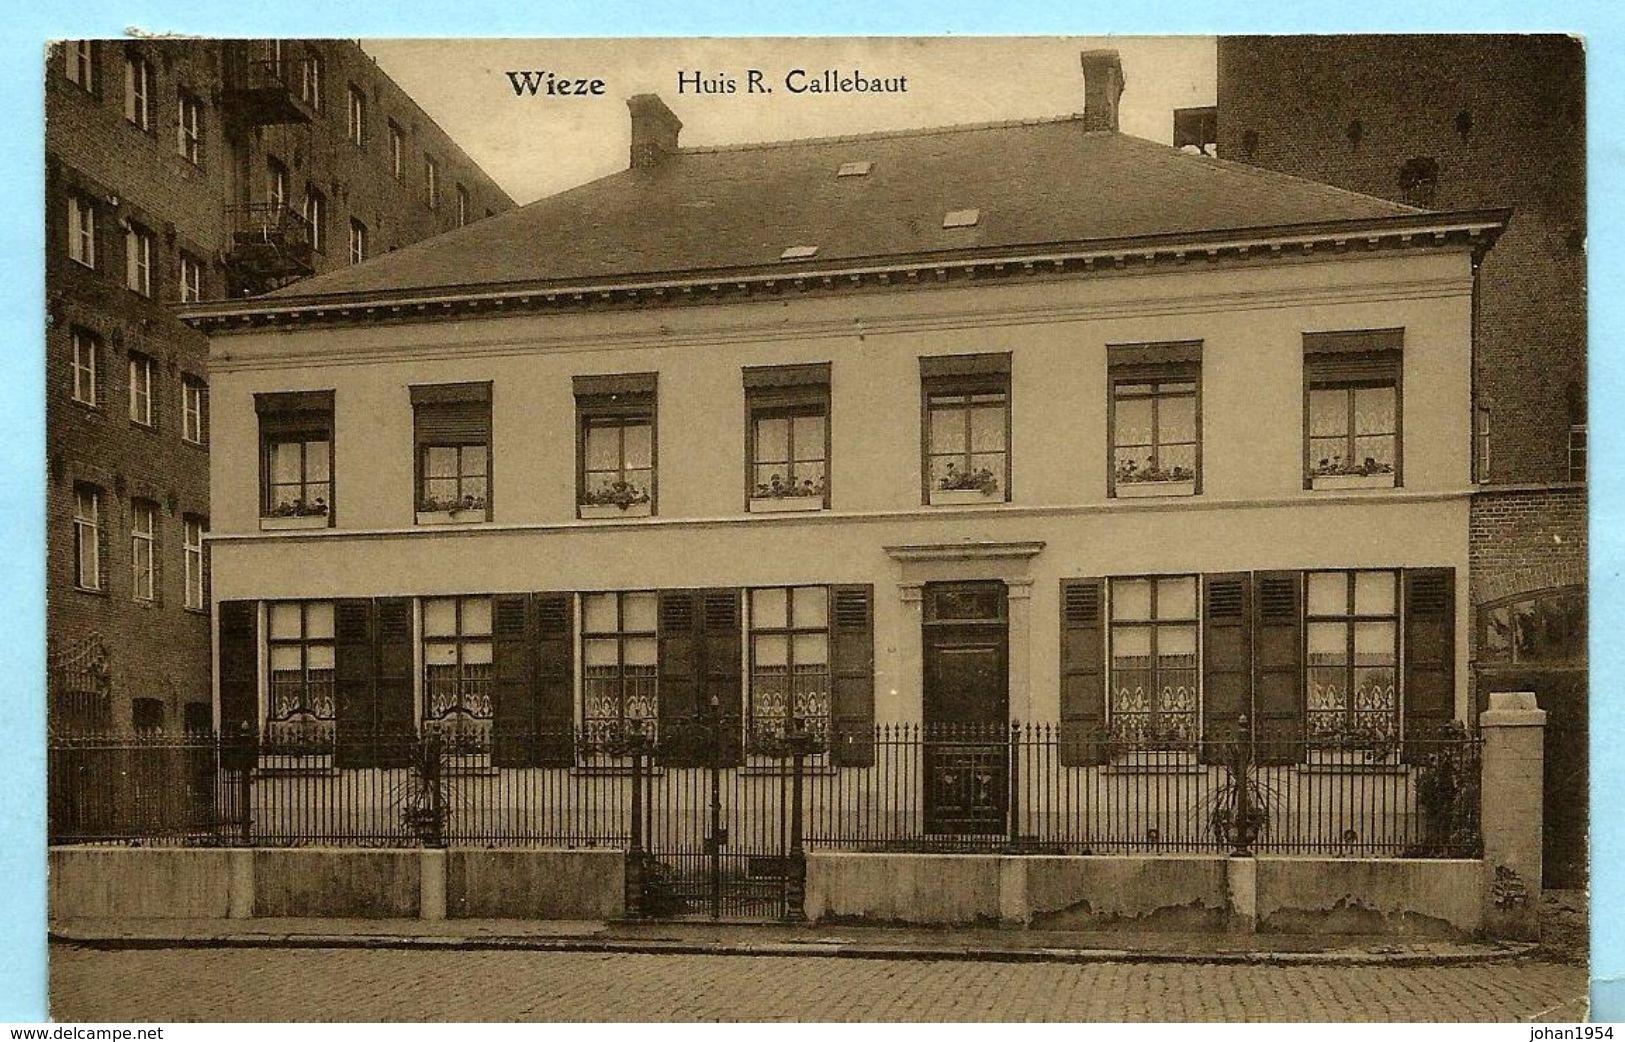 WIEZE - Huis R. Callebaut - Lebbeke